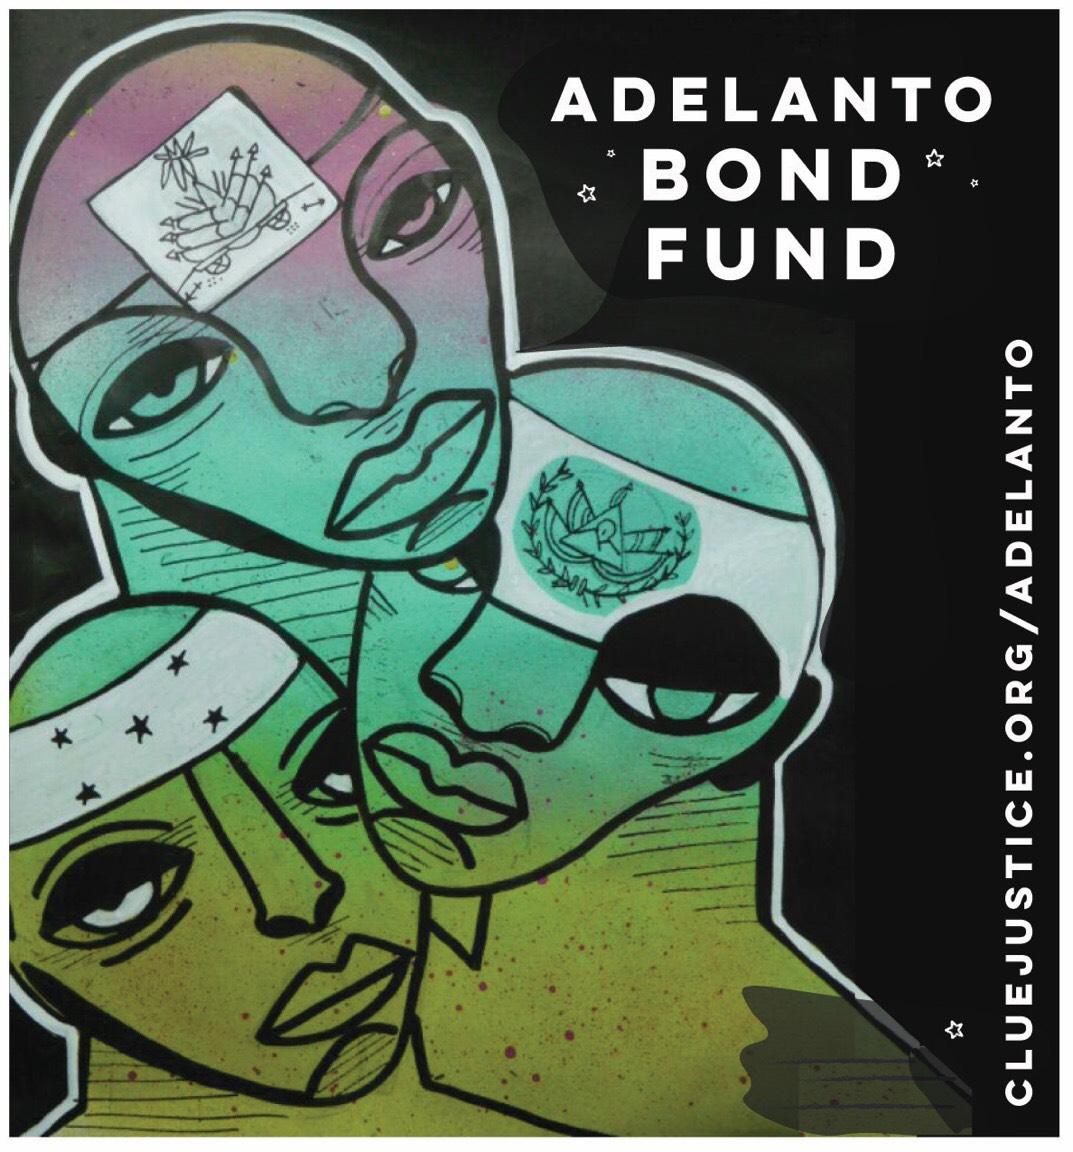 Adelanto_Bond_Fund_Artwork.jpg